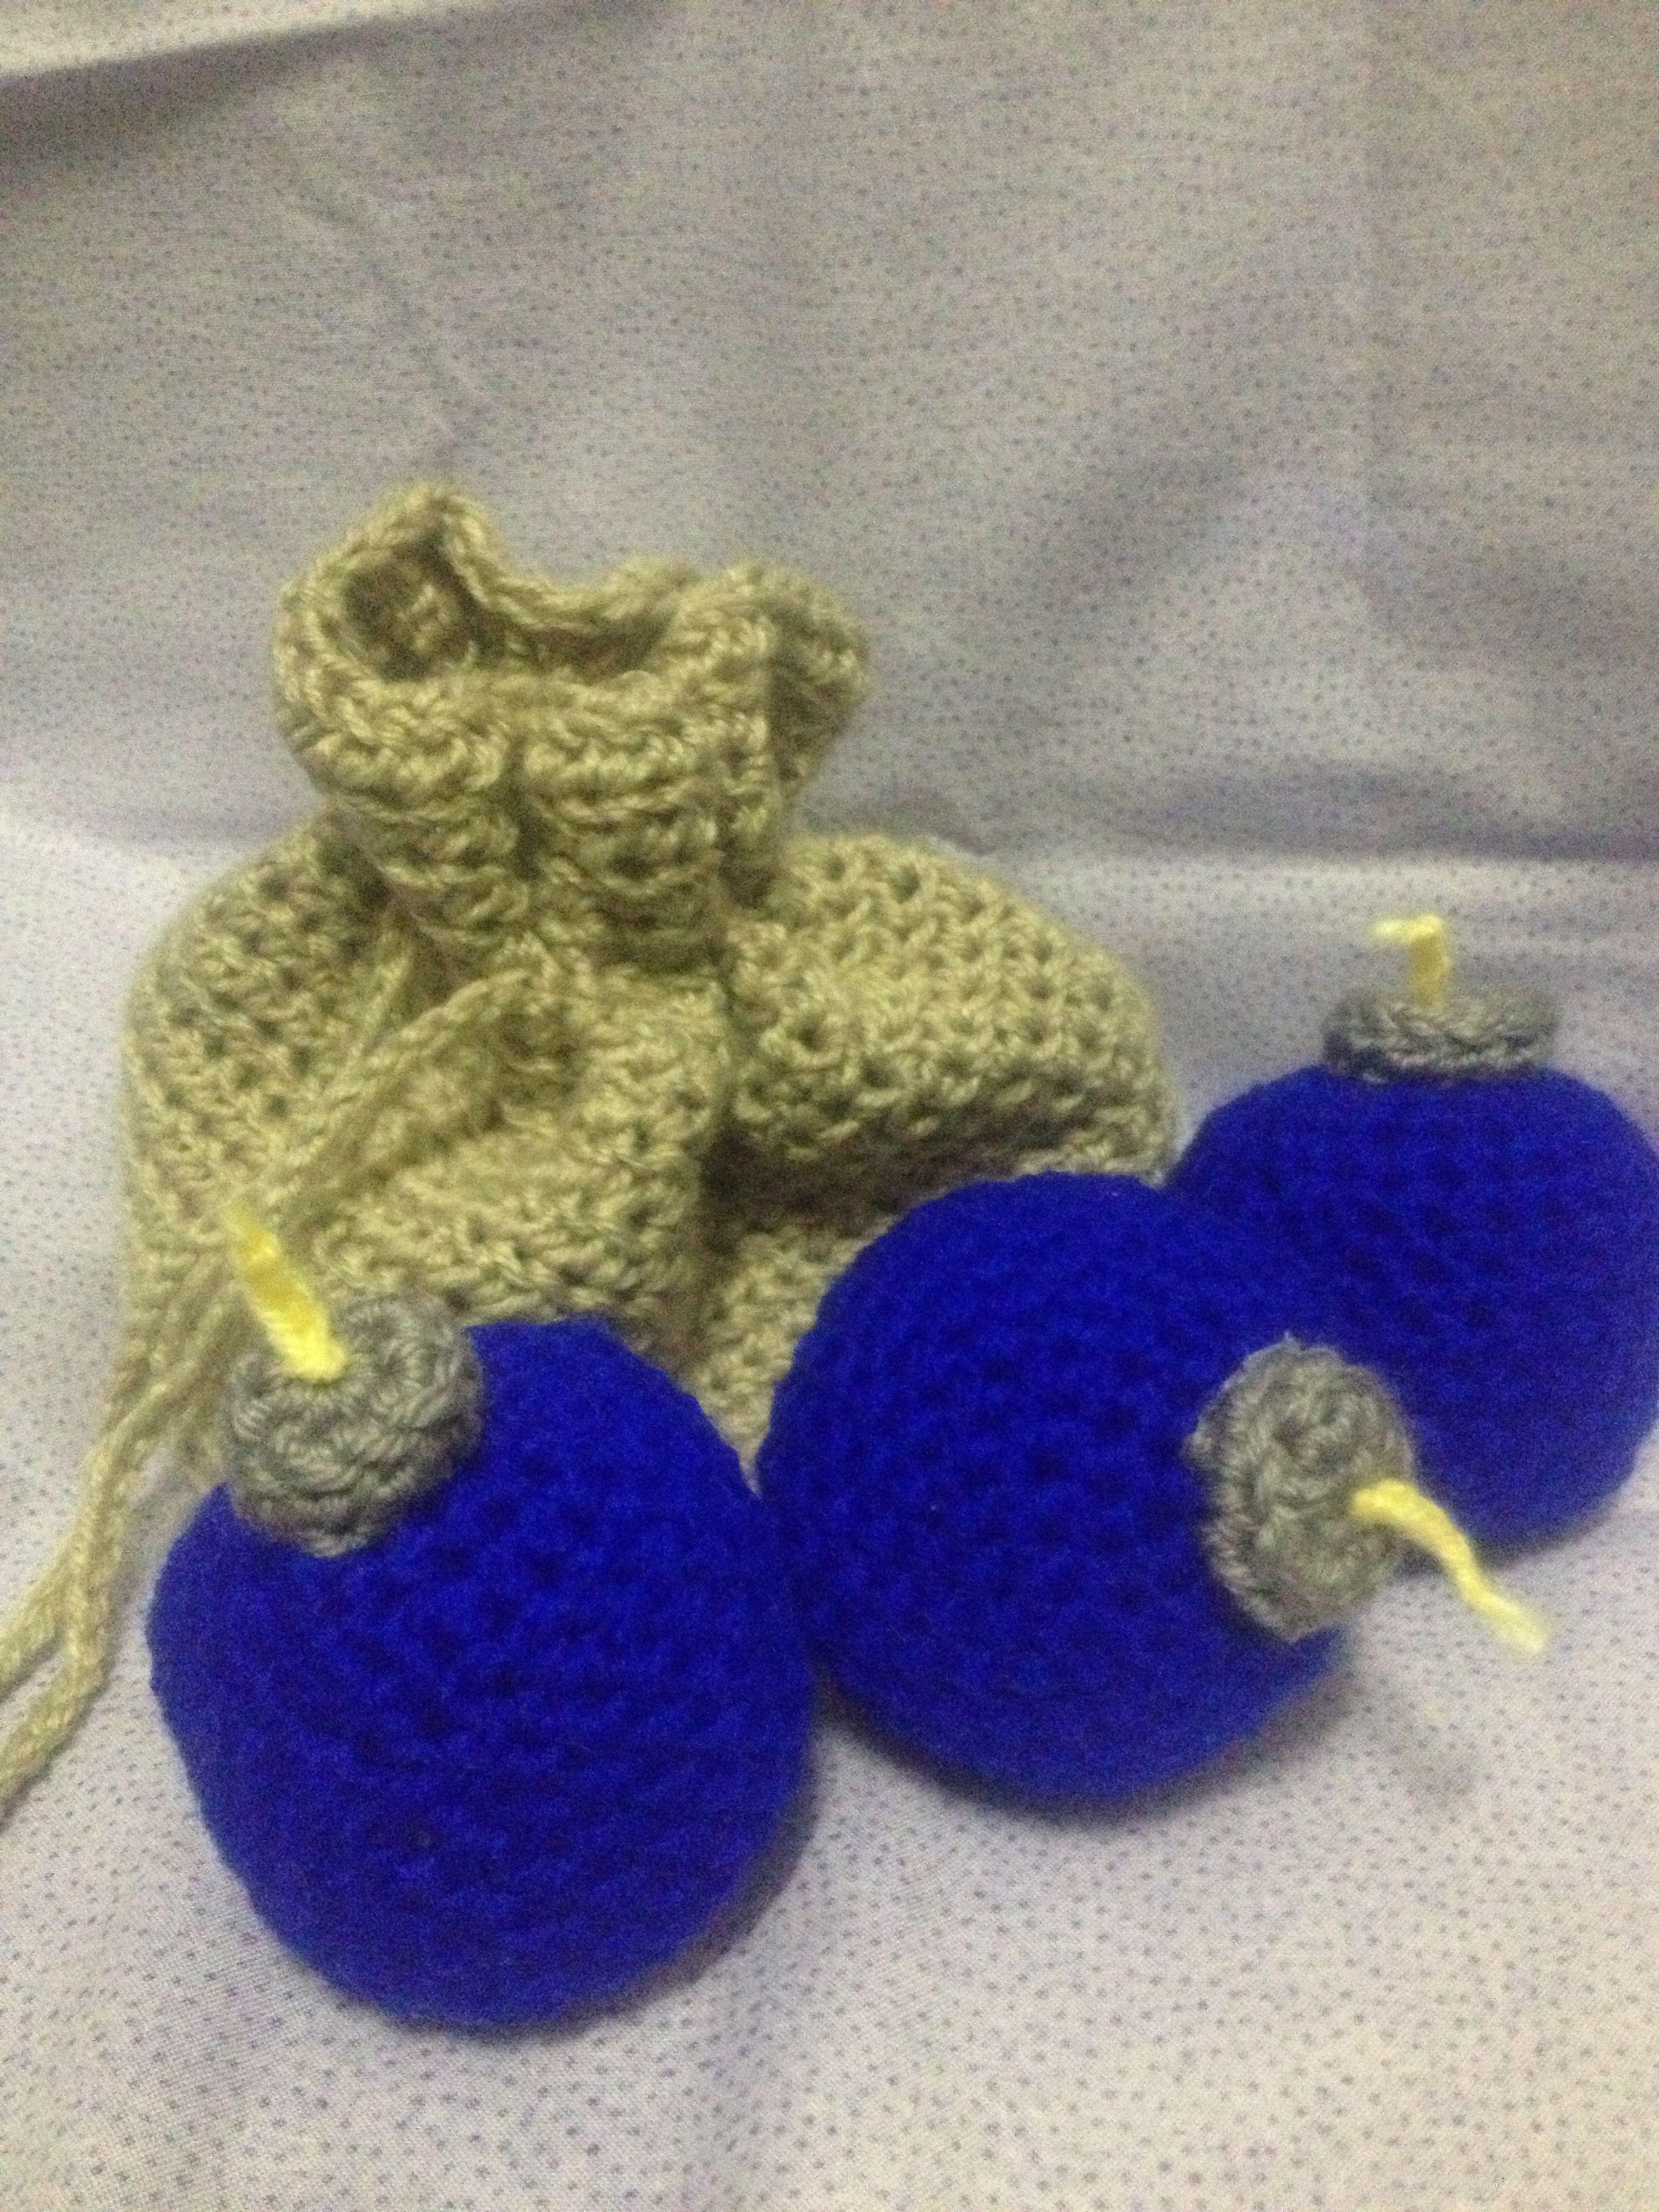 Crochet Stitches Legend : Legend of Zelda - crochet bombs and bag crafts Pinterest